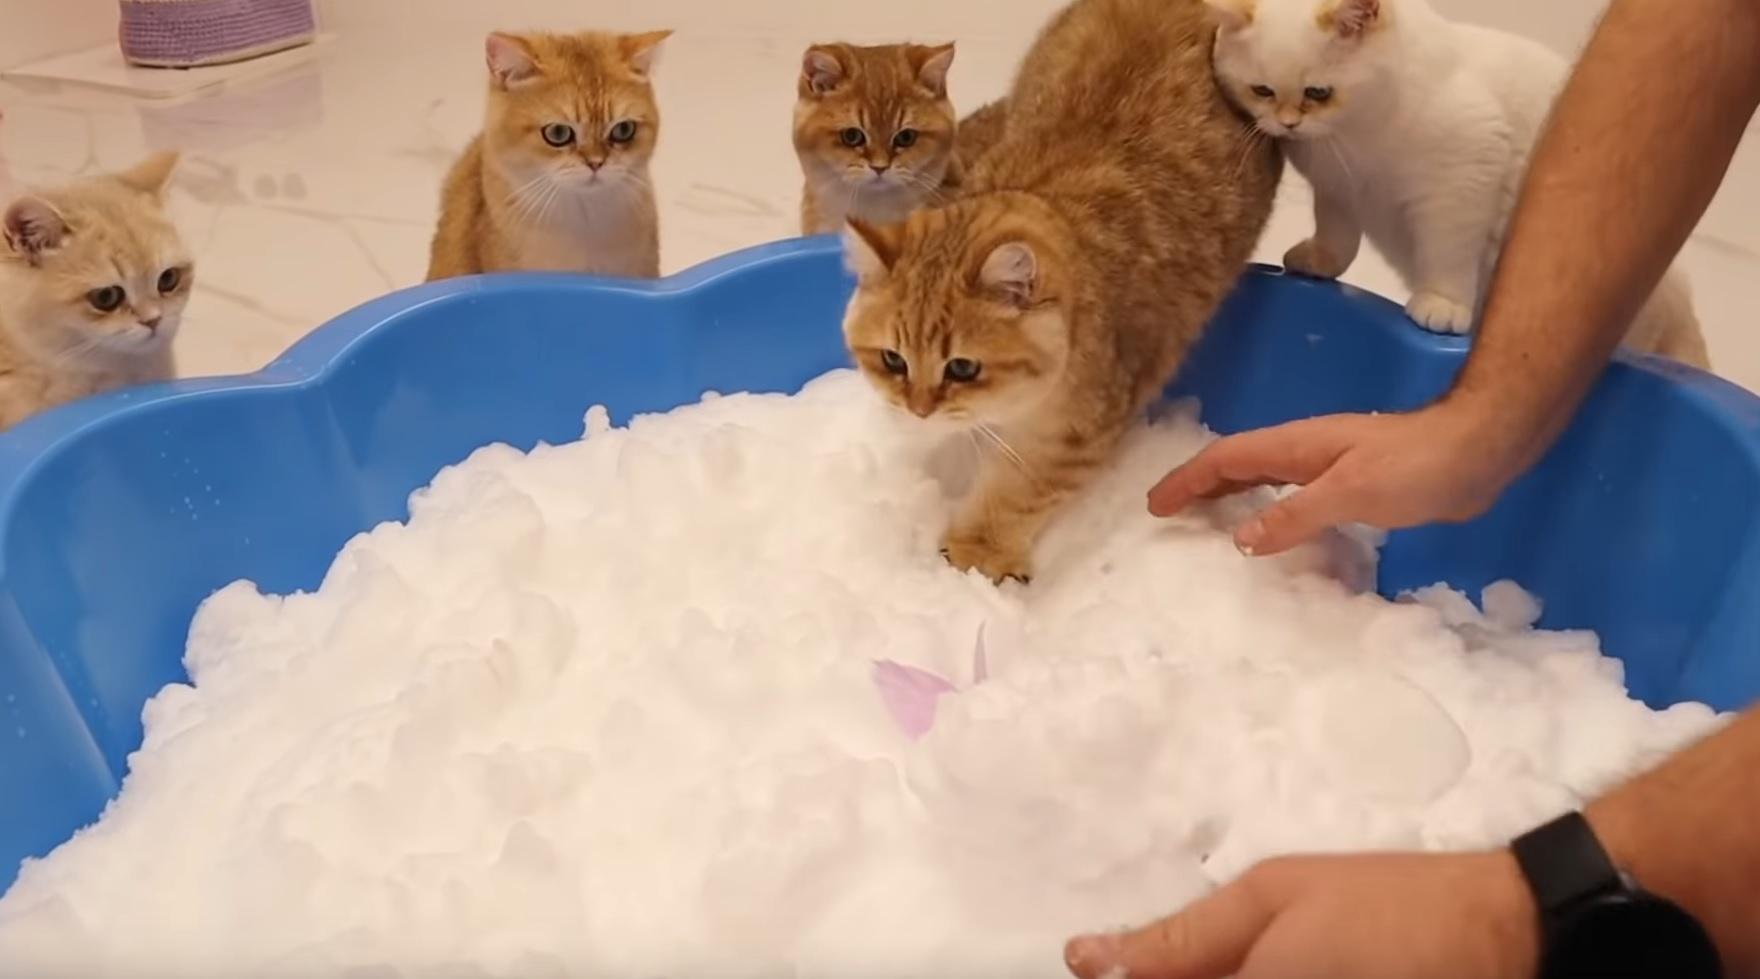 Cats Inspect Snow